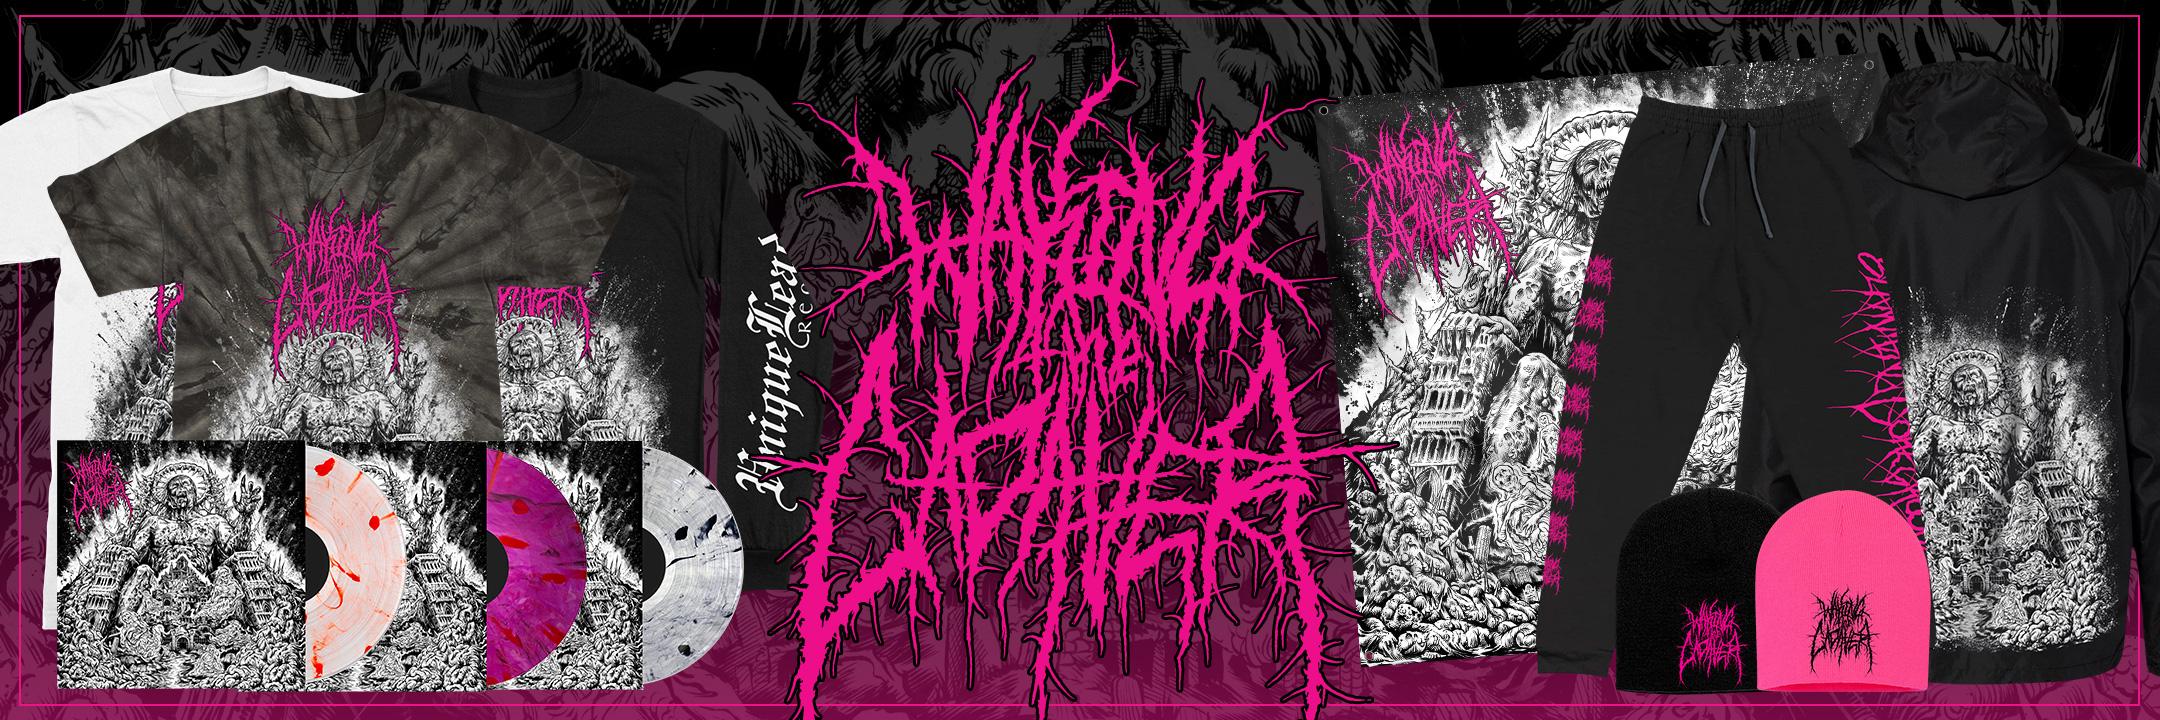 Waking The Cadaver